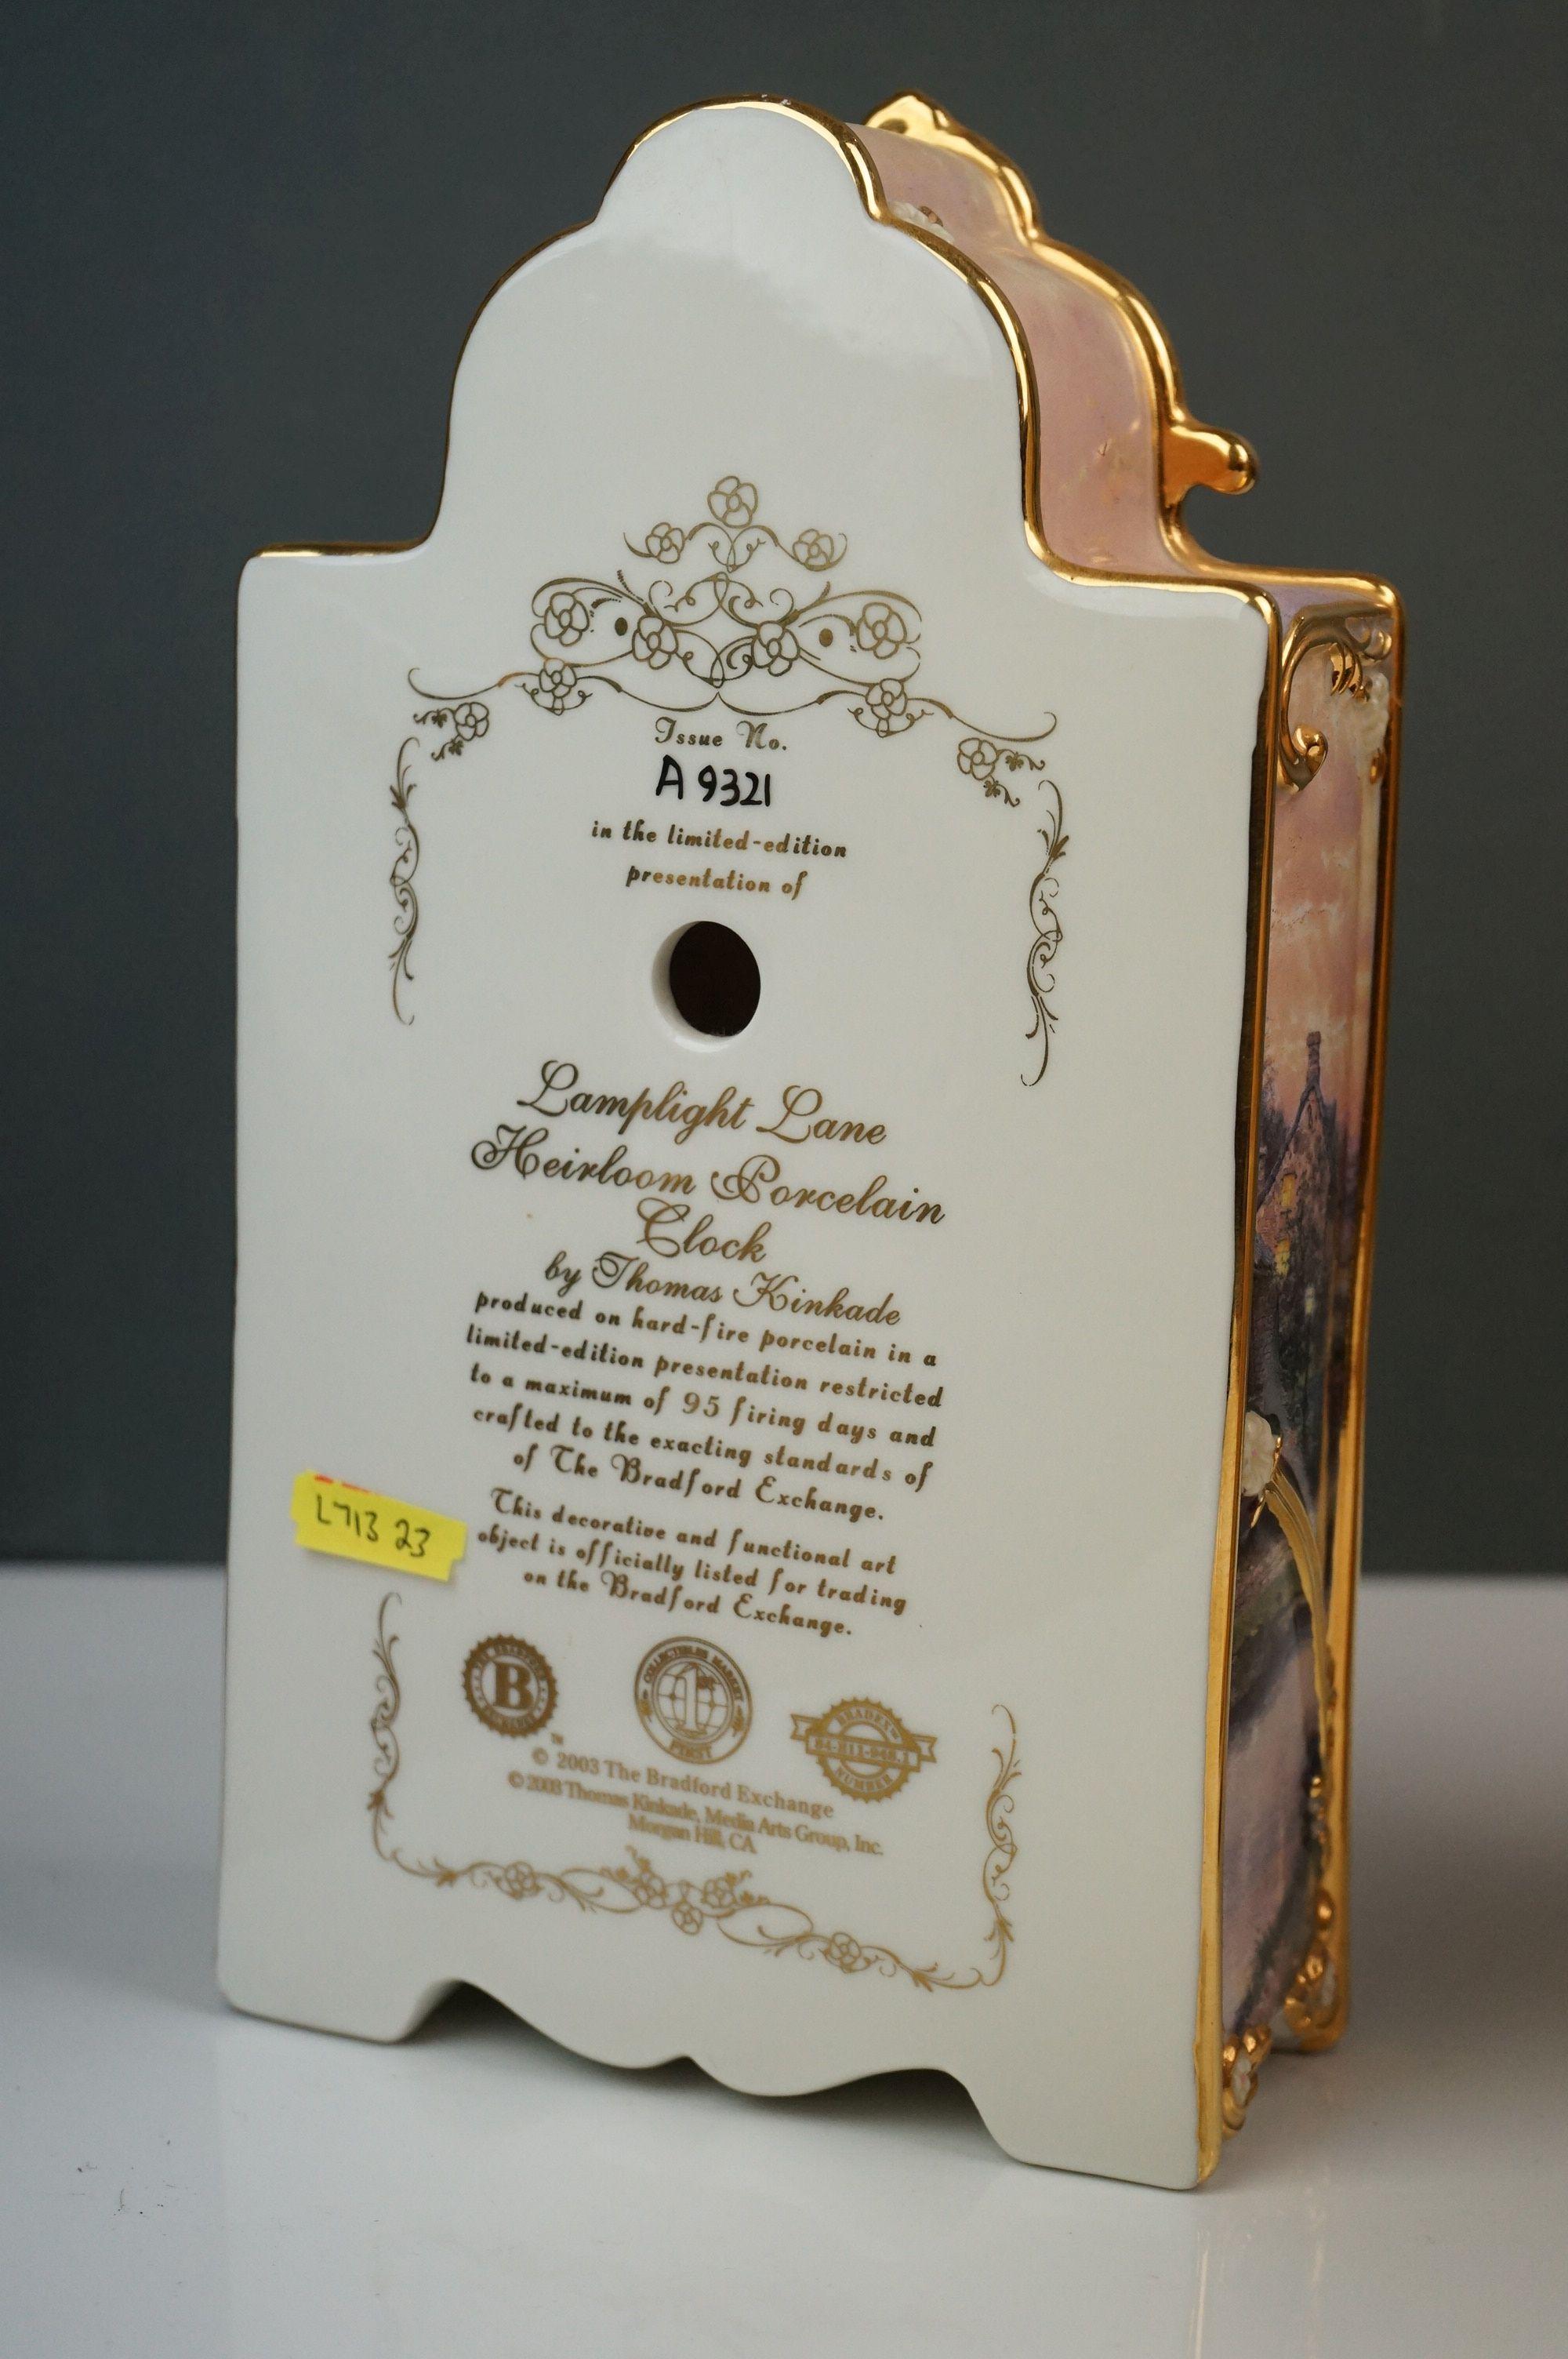 Bradford Exchange Lamplight Lane Heirloom porcelain clock by Thomas Kinkade, issue no. A9321, - Image 3 of 9